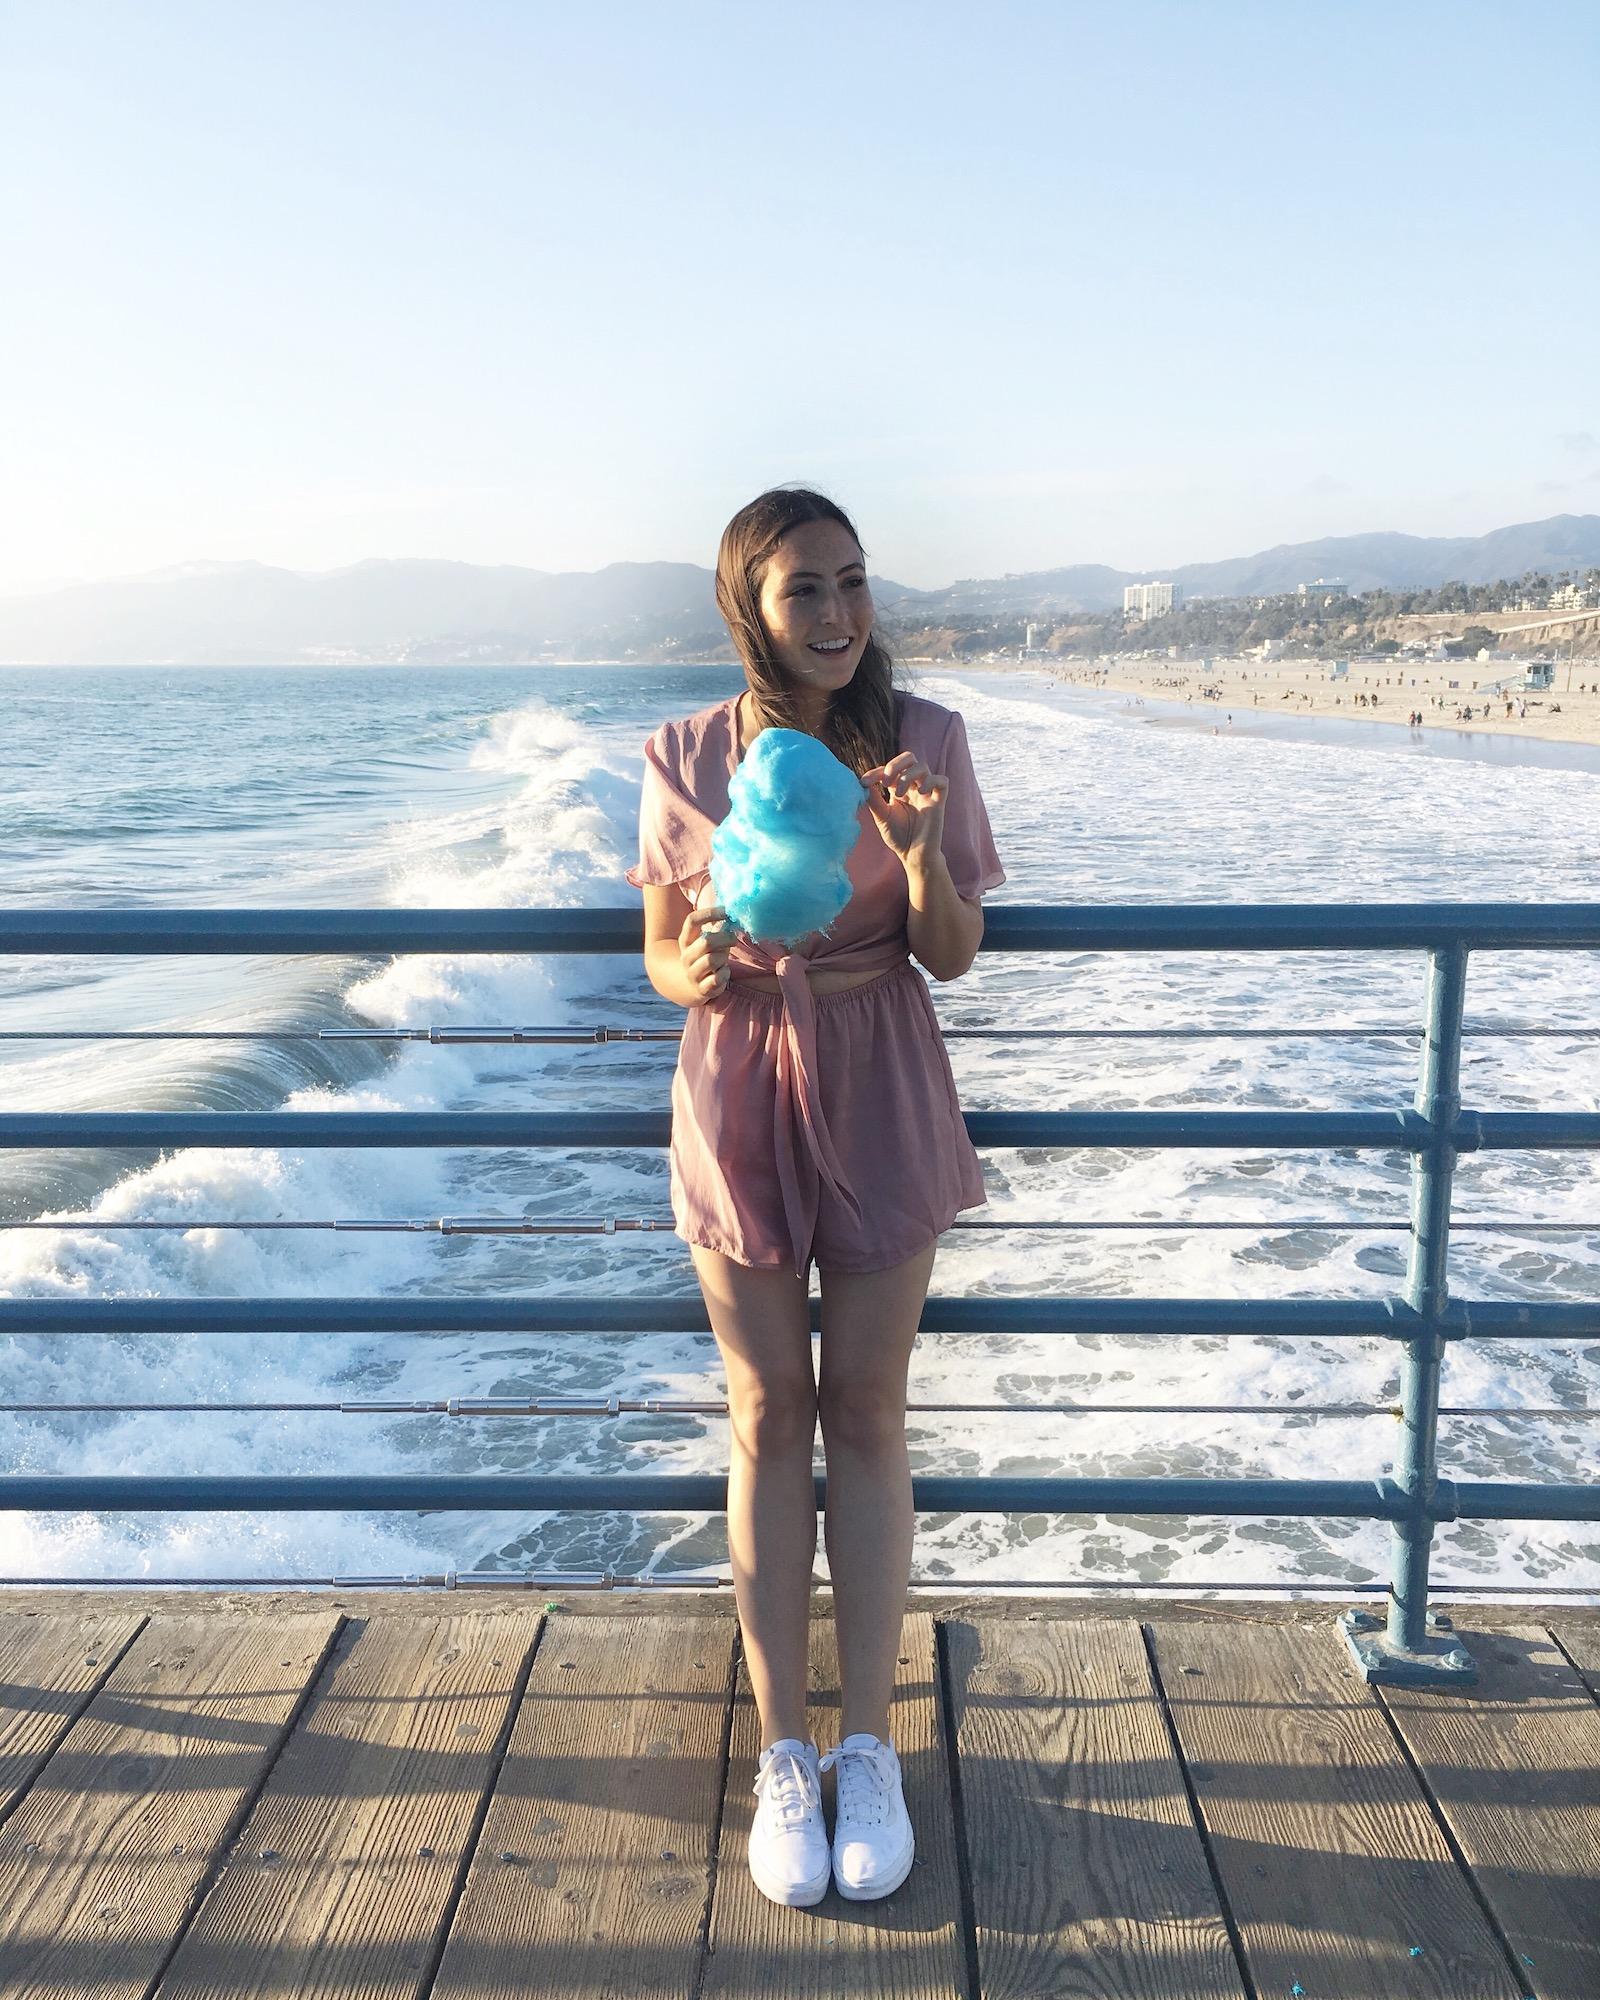 Santa Monica Pier Cotton Candy